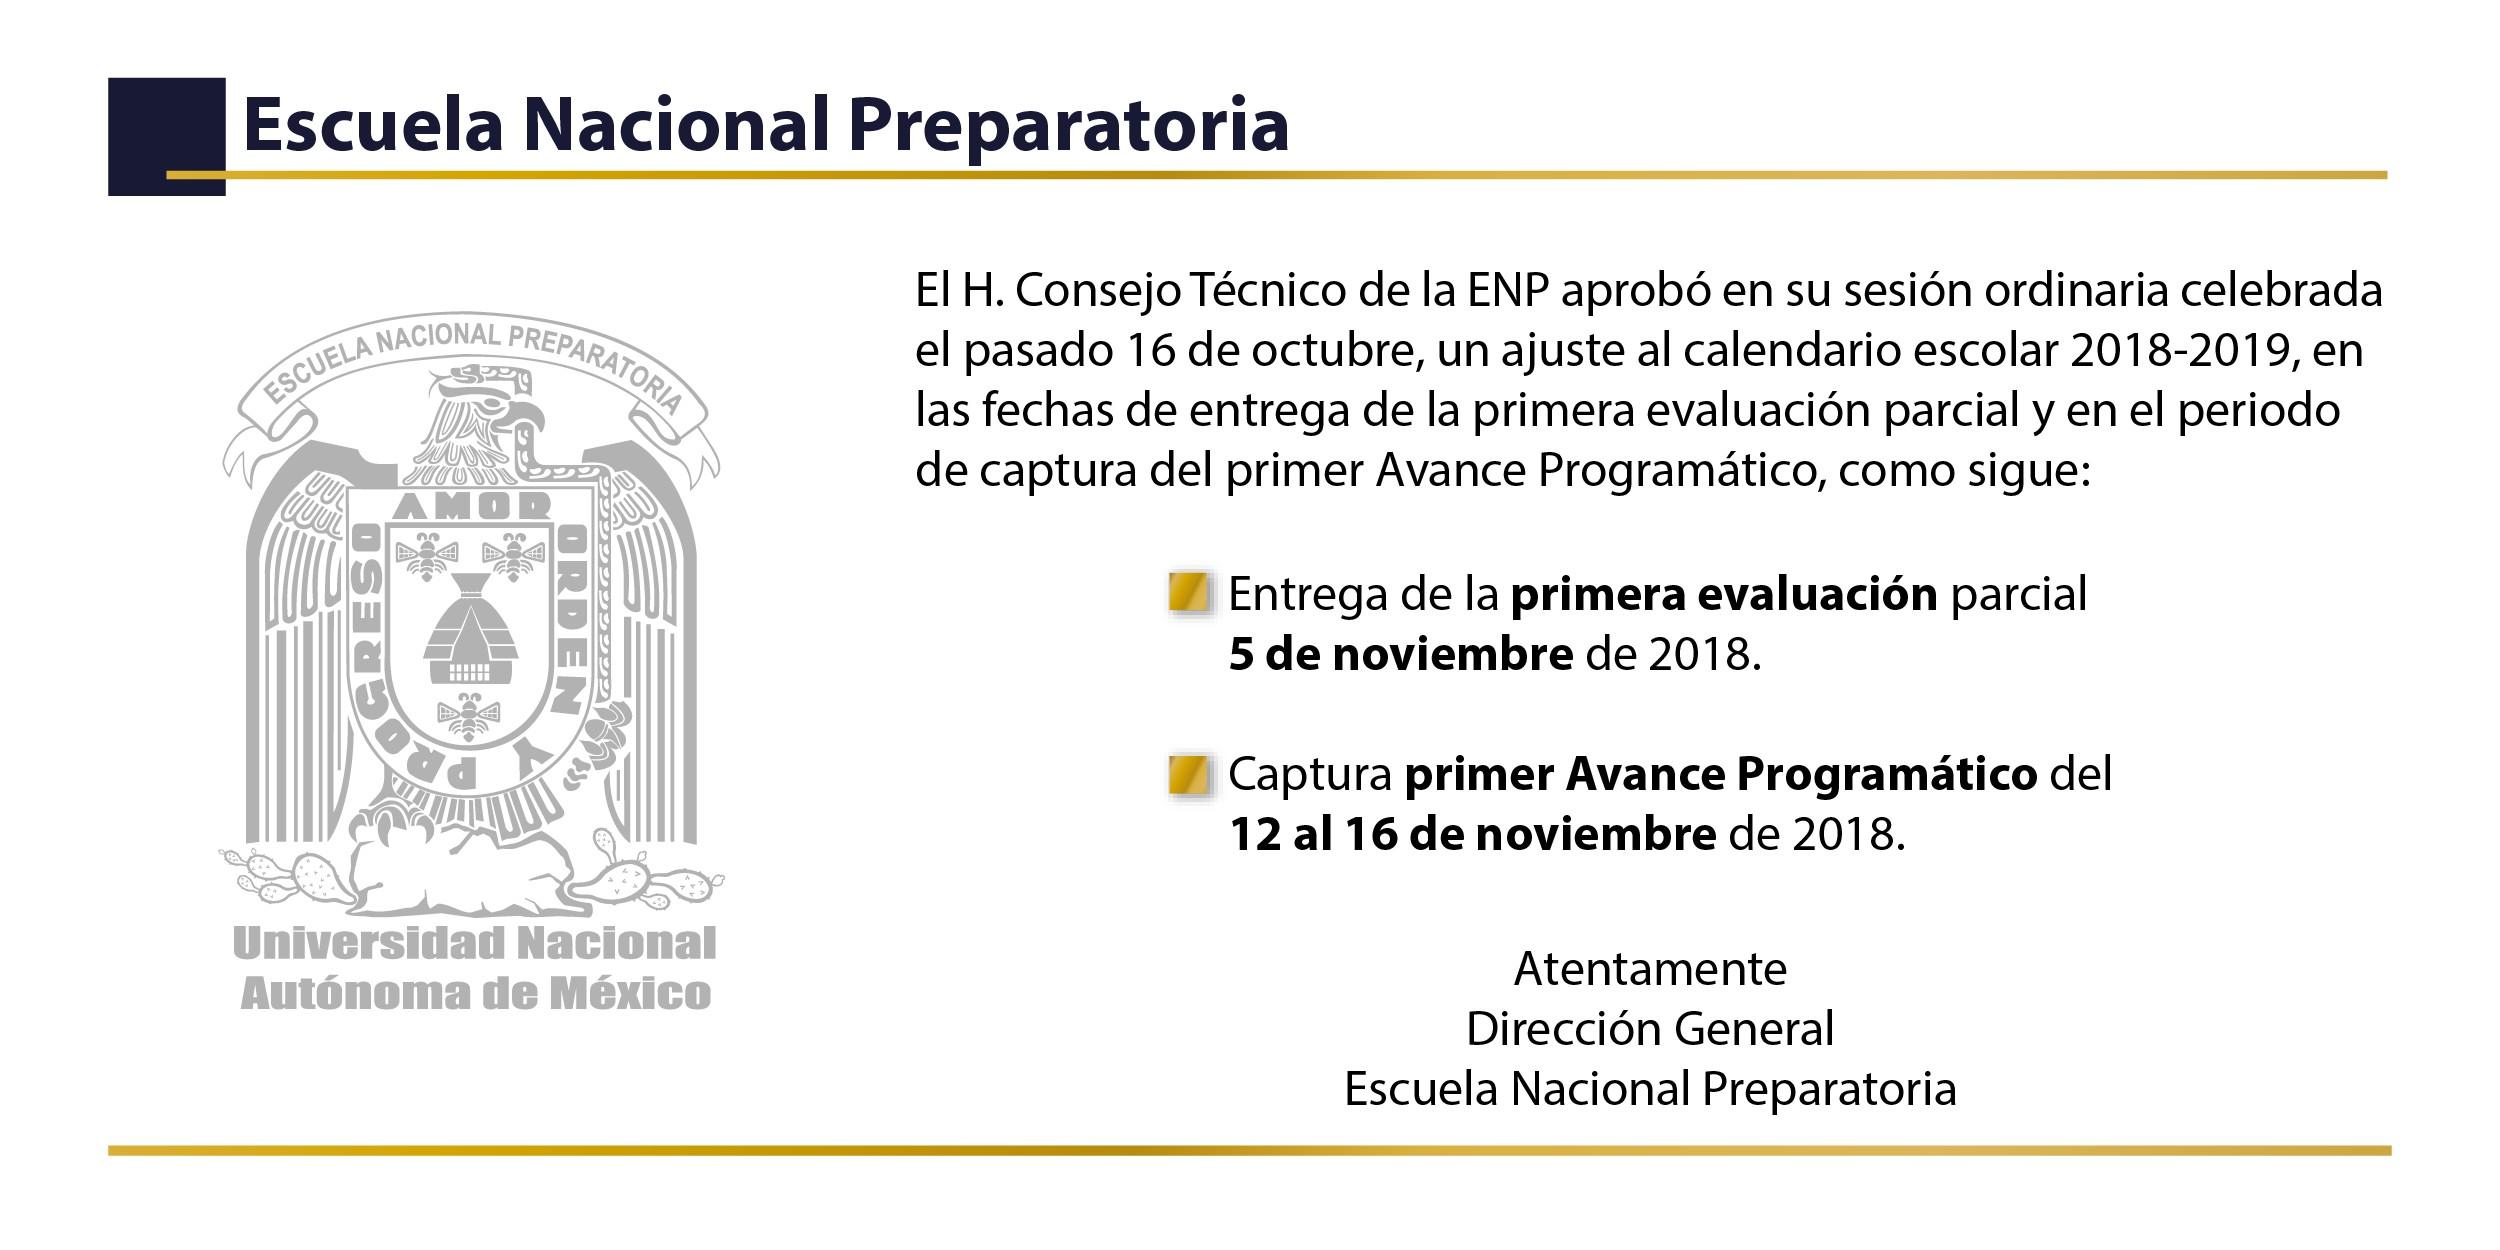 Calendario Imprimir Mundial 2019 Recientes Inicio Unam Dgenp México Of Calendario Imprimir Mundial 2019 Más Recientes Calendario Scouts Msc 2019